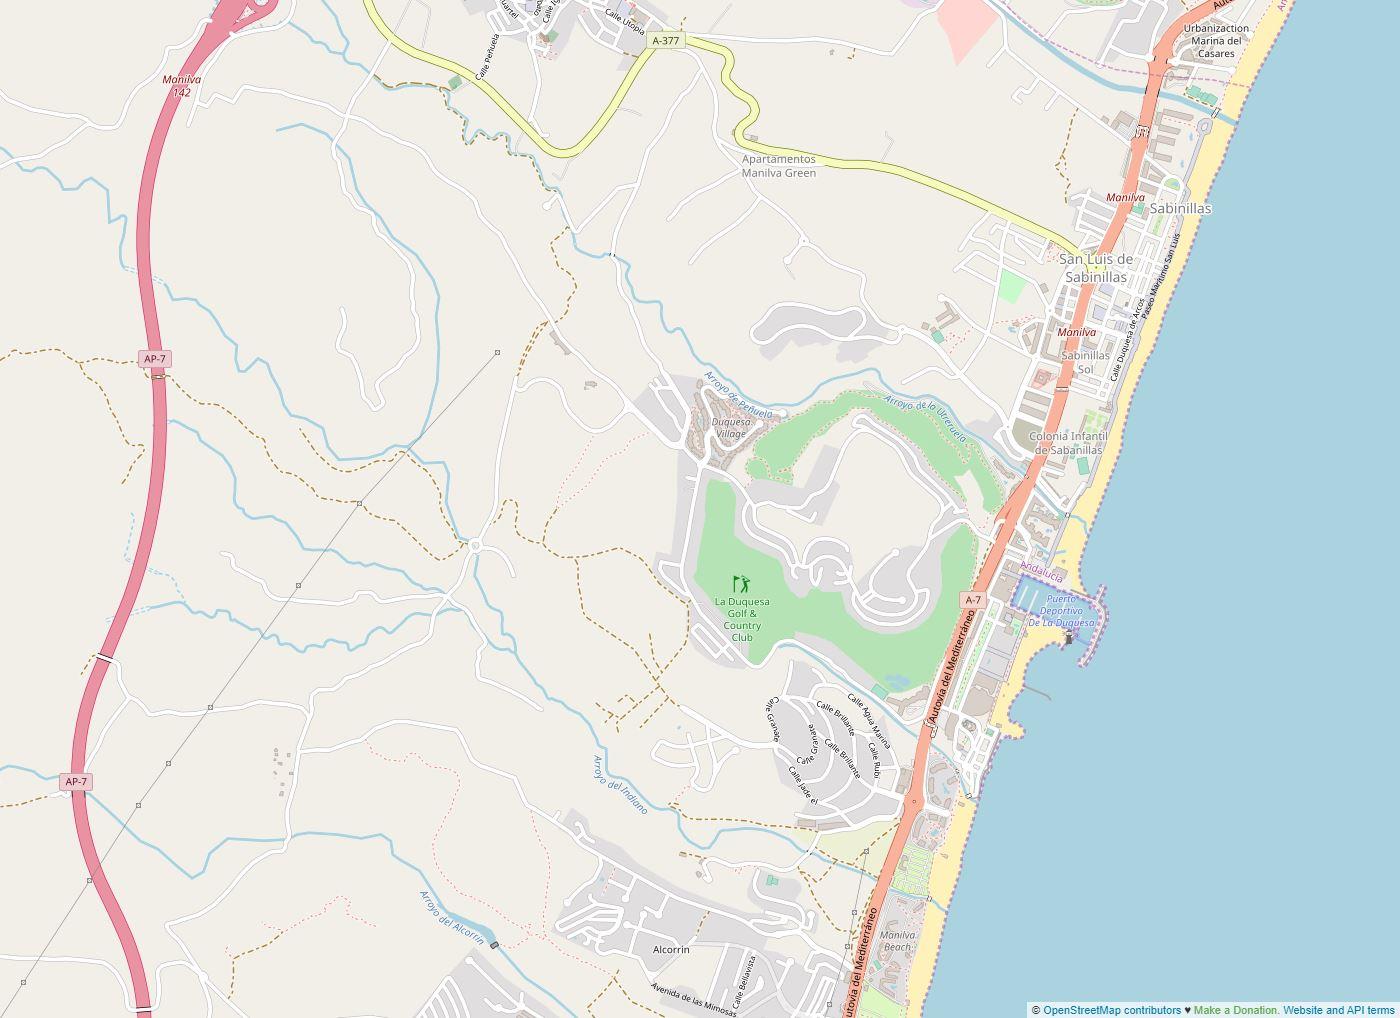 Spend your winter in Puerto de la Duequesa, Spain: Is Puerto de la Duequesaa good snowbird location? 4